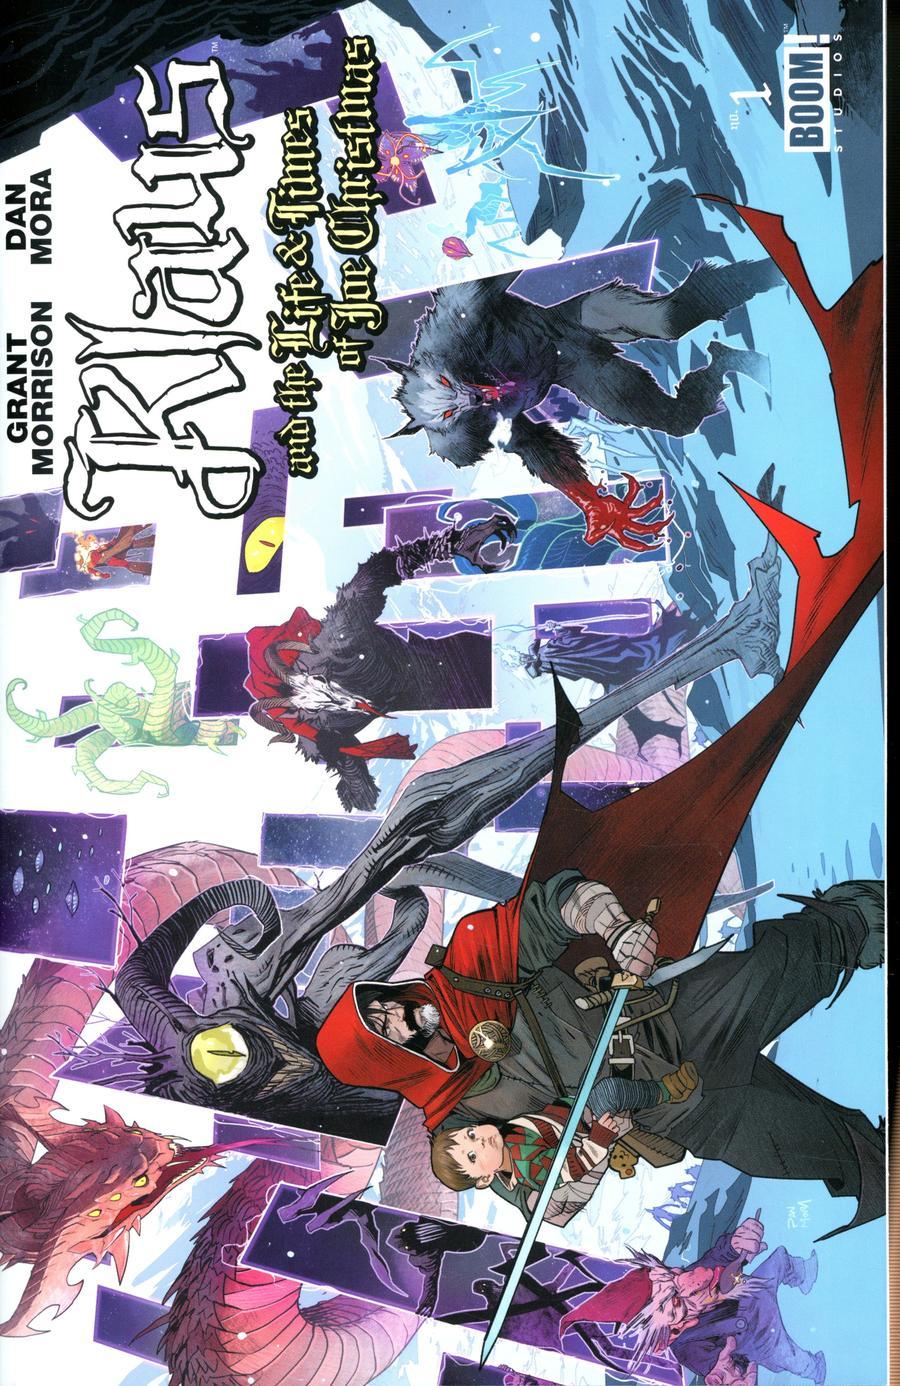 Klaus And The Life And Times Of Joe Christmas #1 Cover A Regular Dan Mora Cover